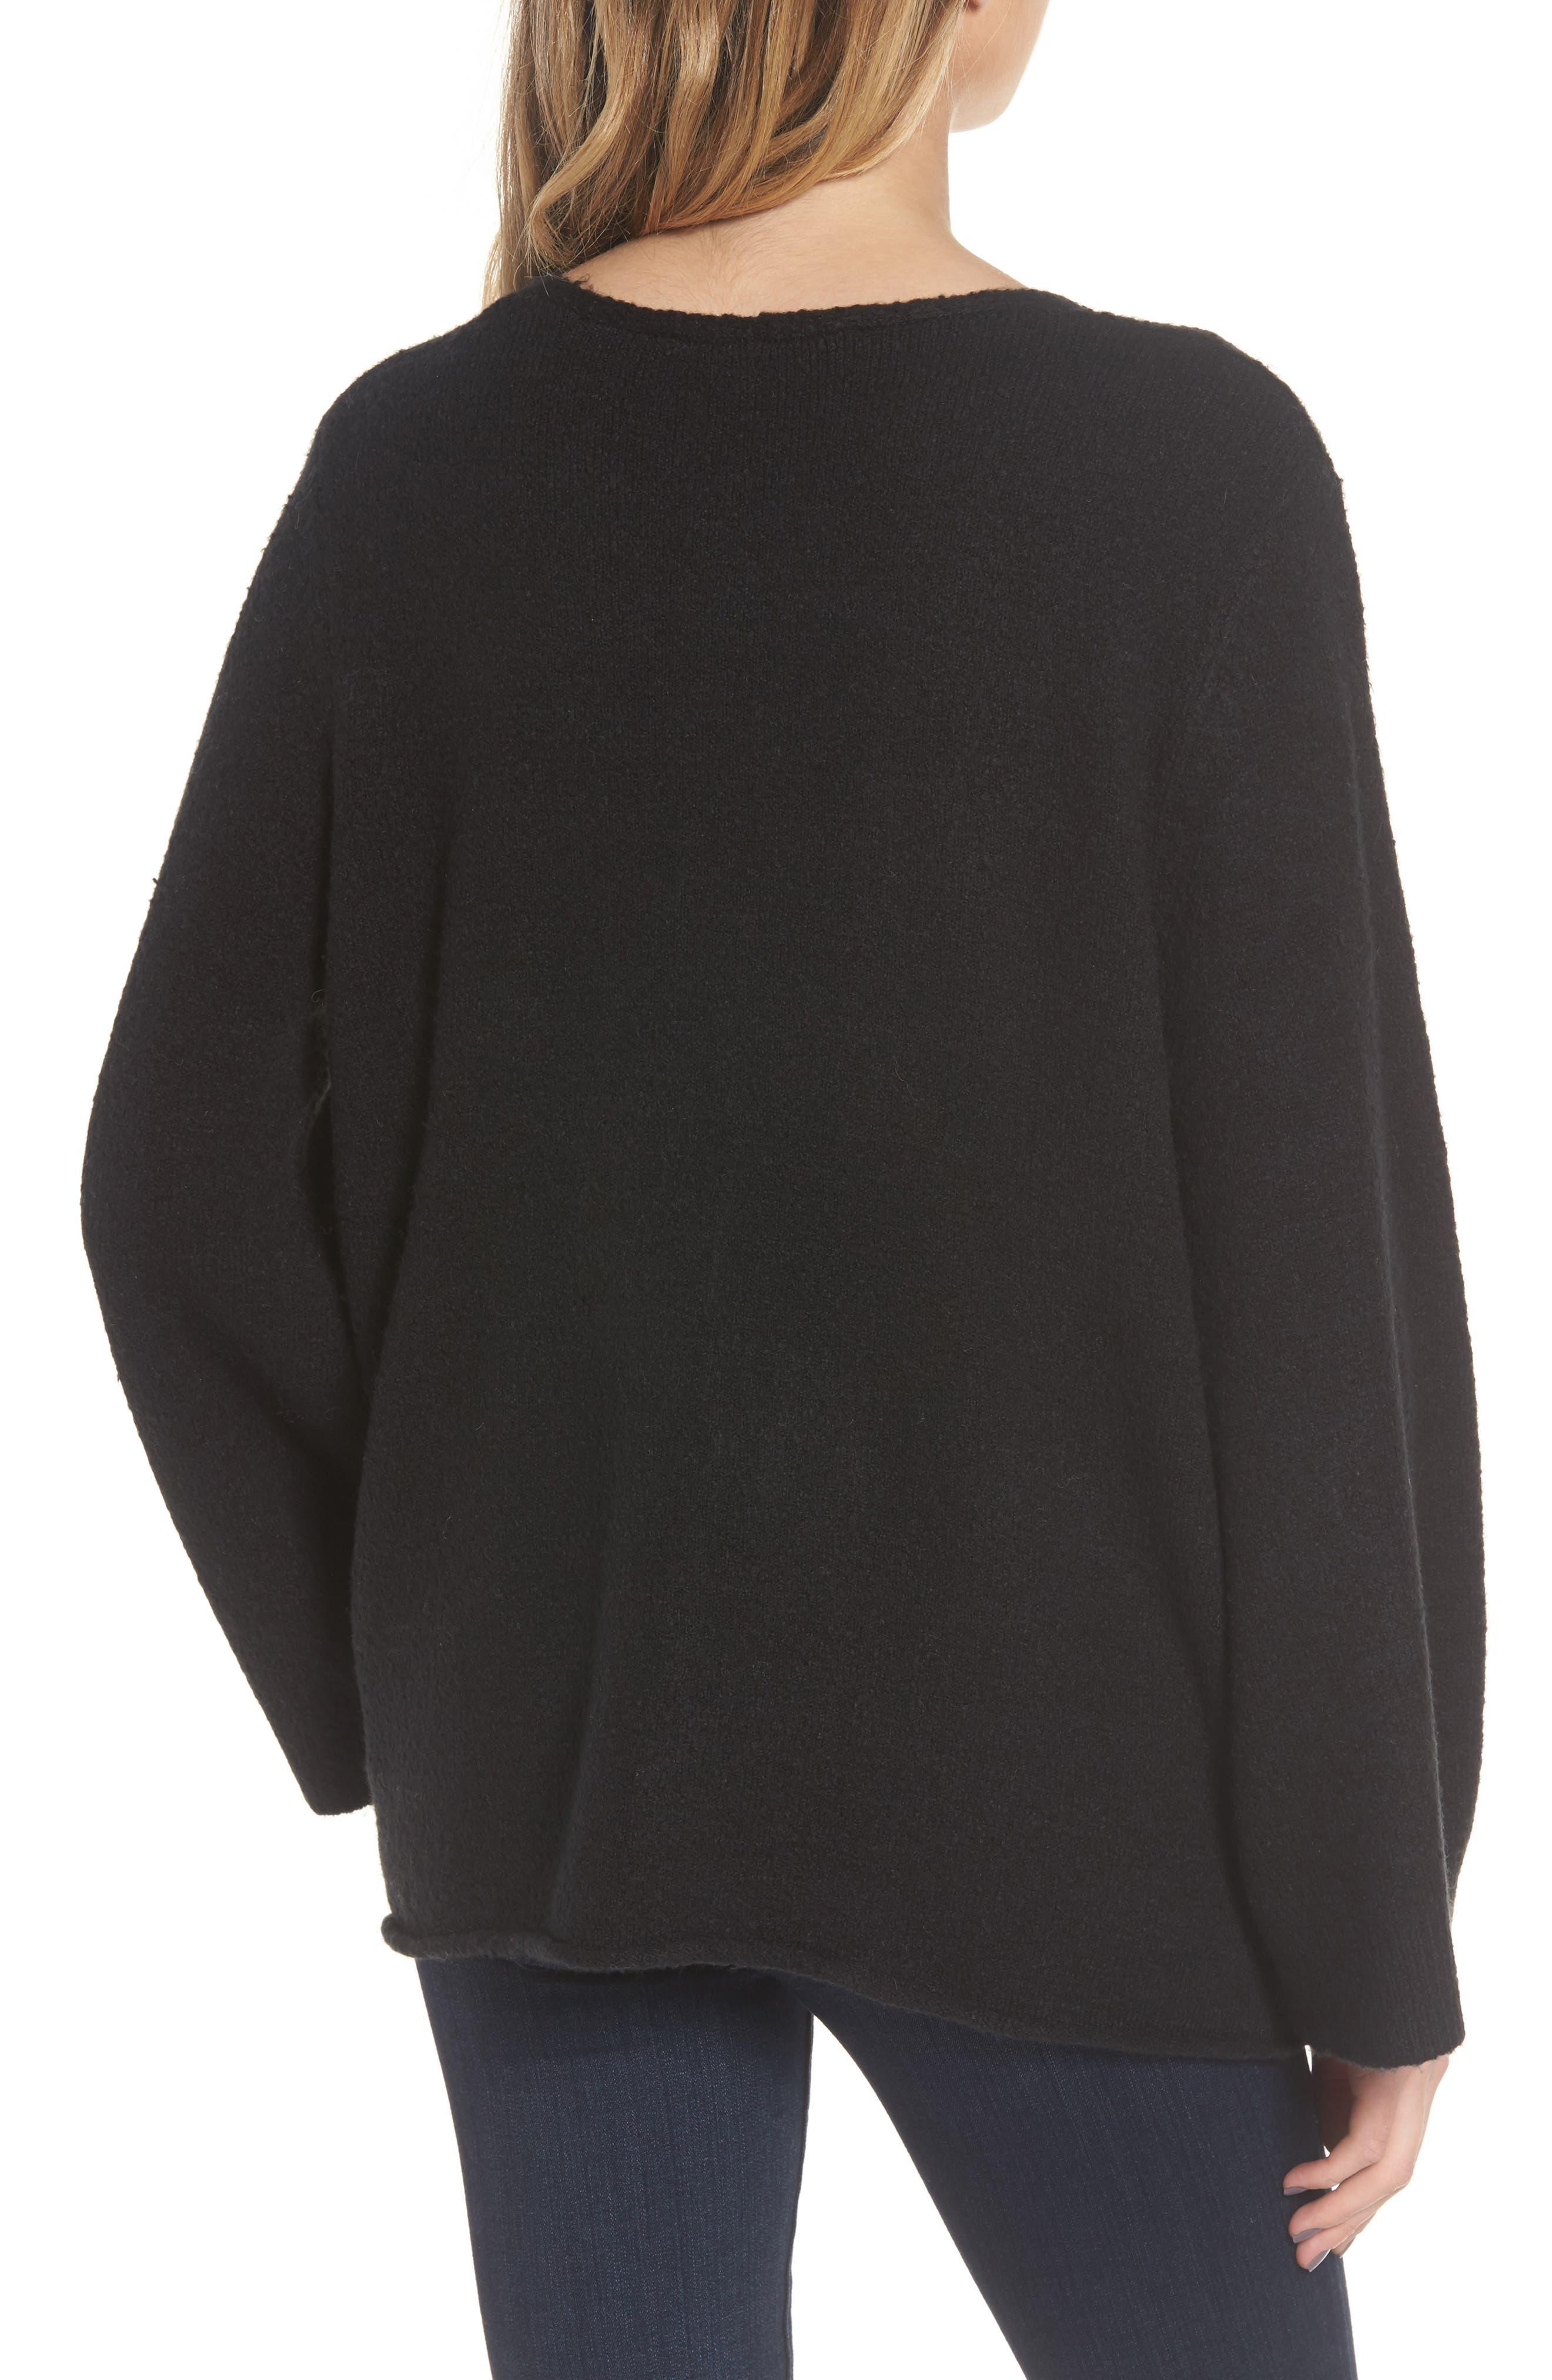 Urban Flossy Sweater,                             Alternate thumbnail 5, color,